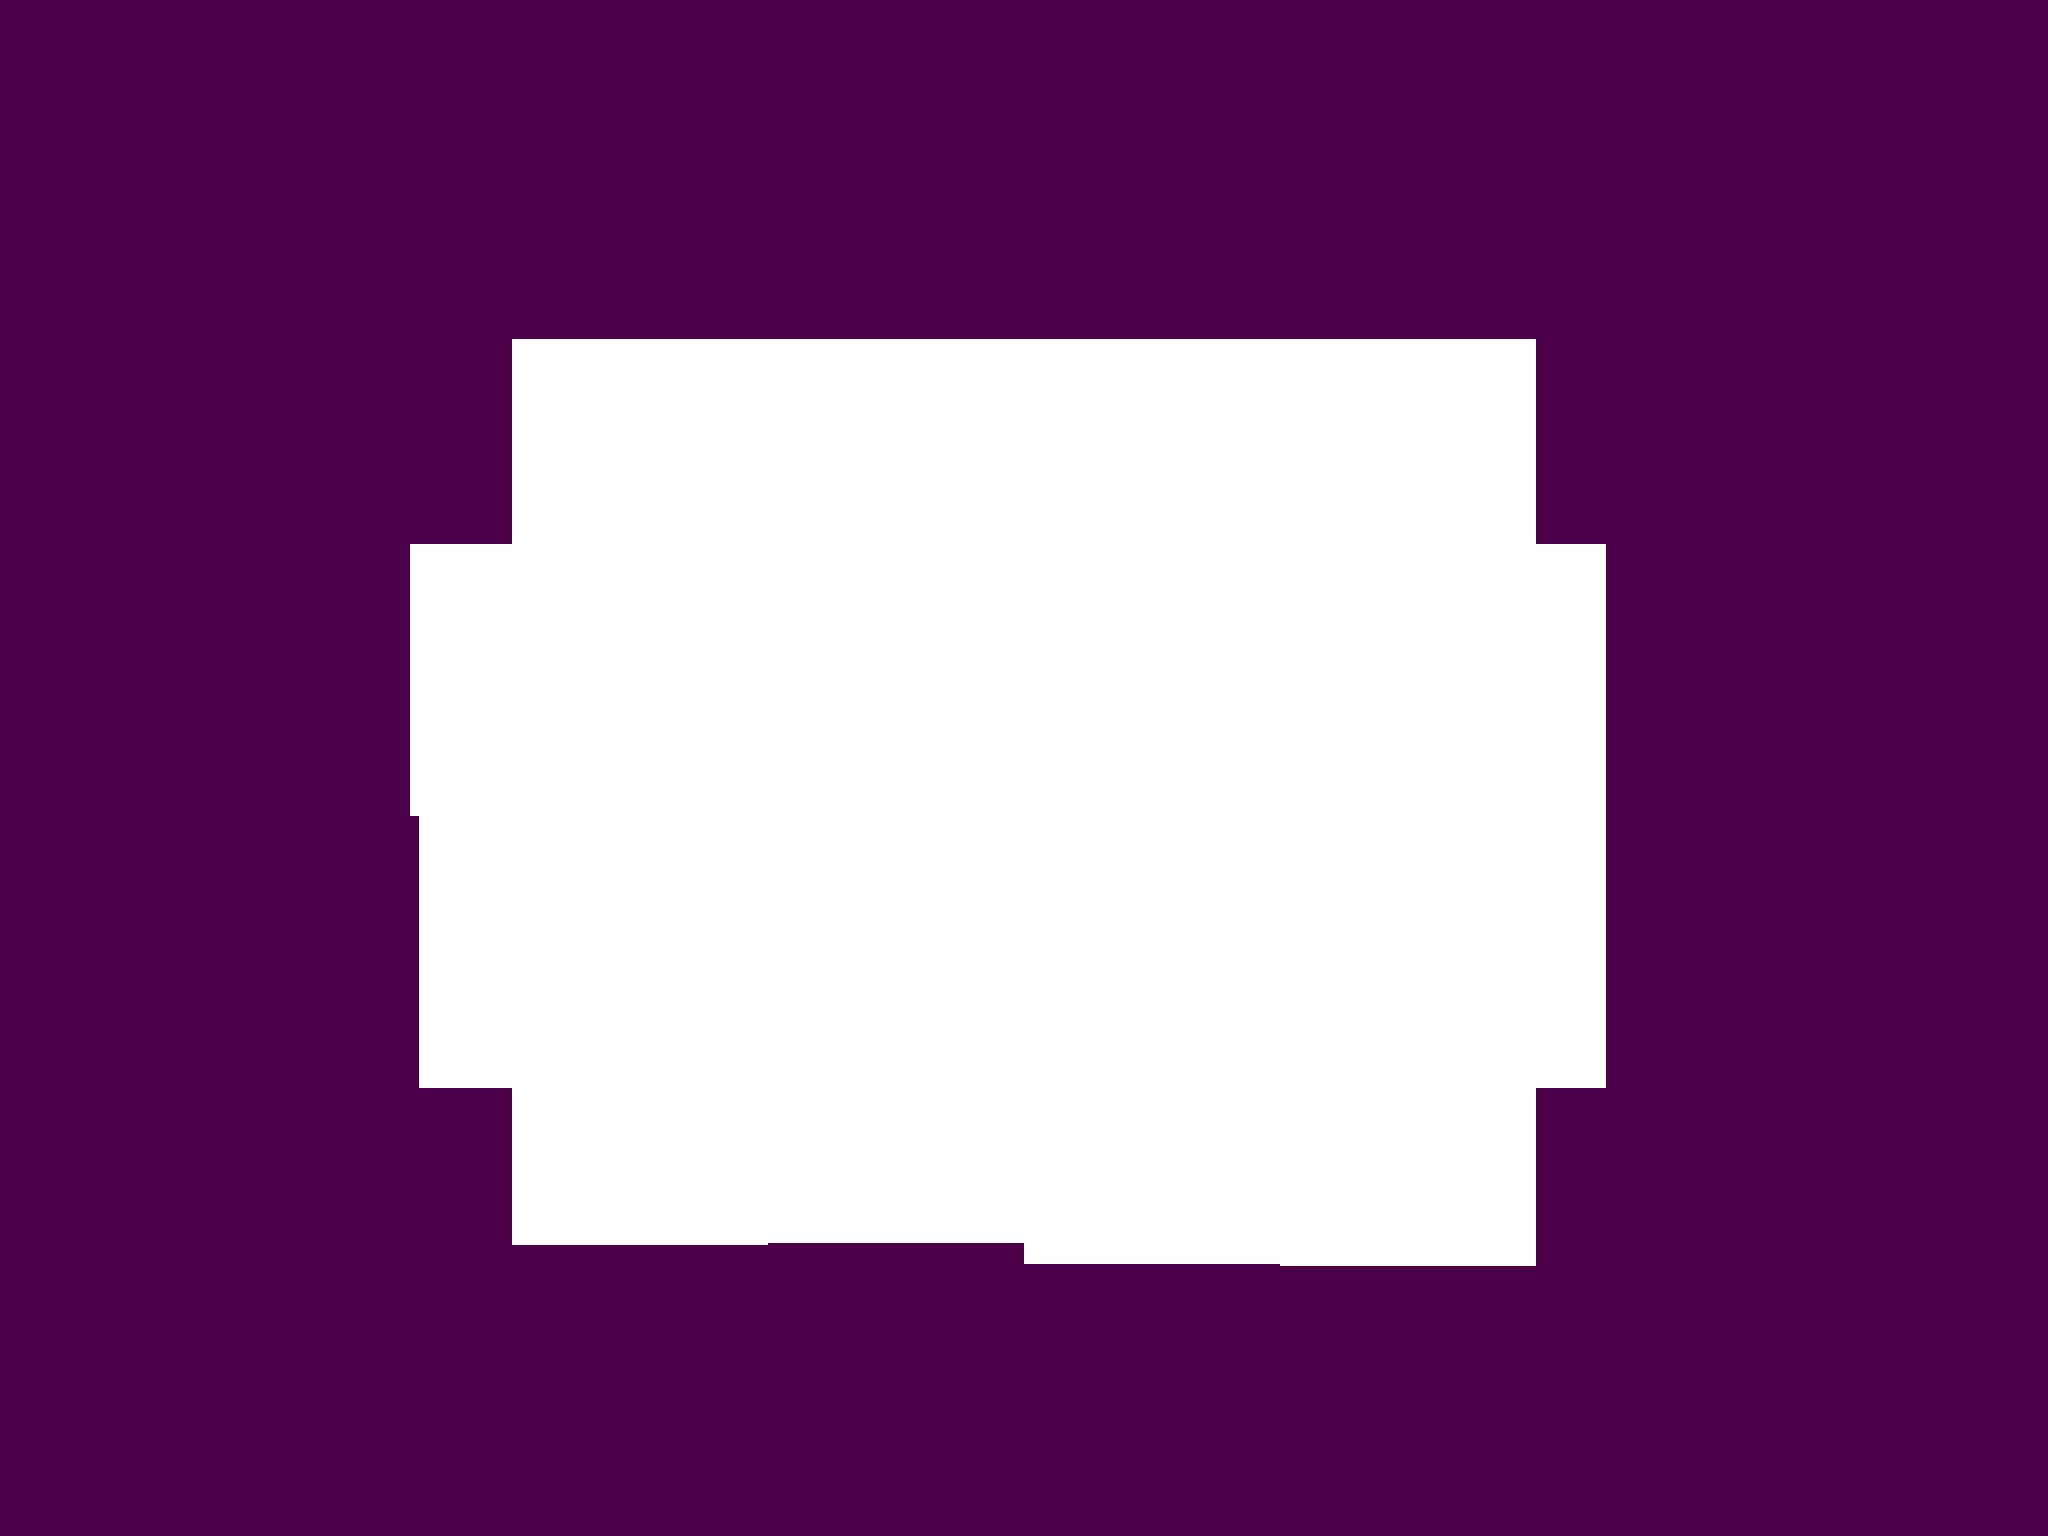 Purple Border 4 By Melmuff Png 2048 1536 Border Design Borders For Paper Border